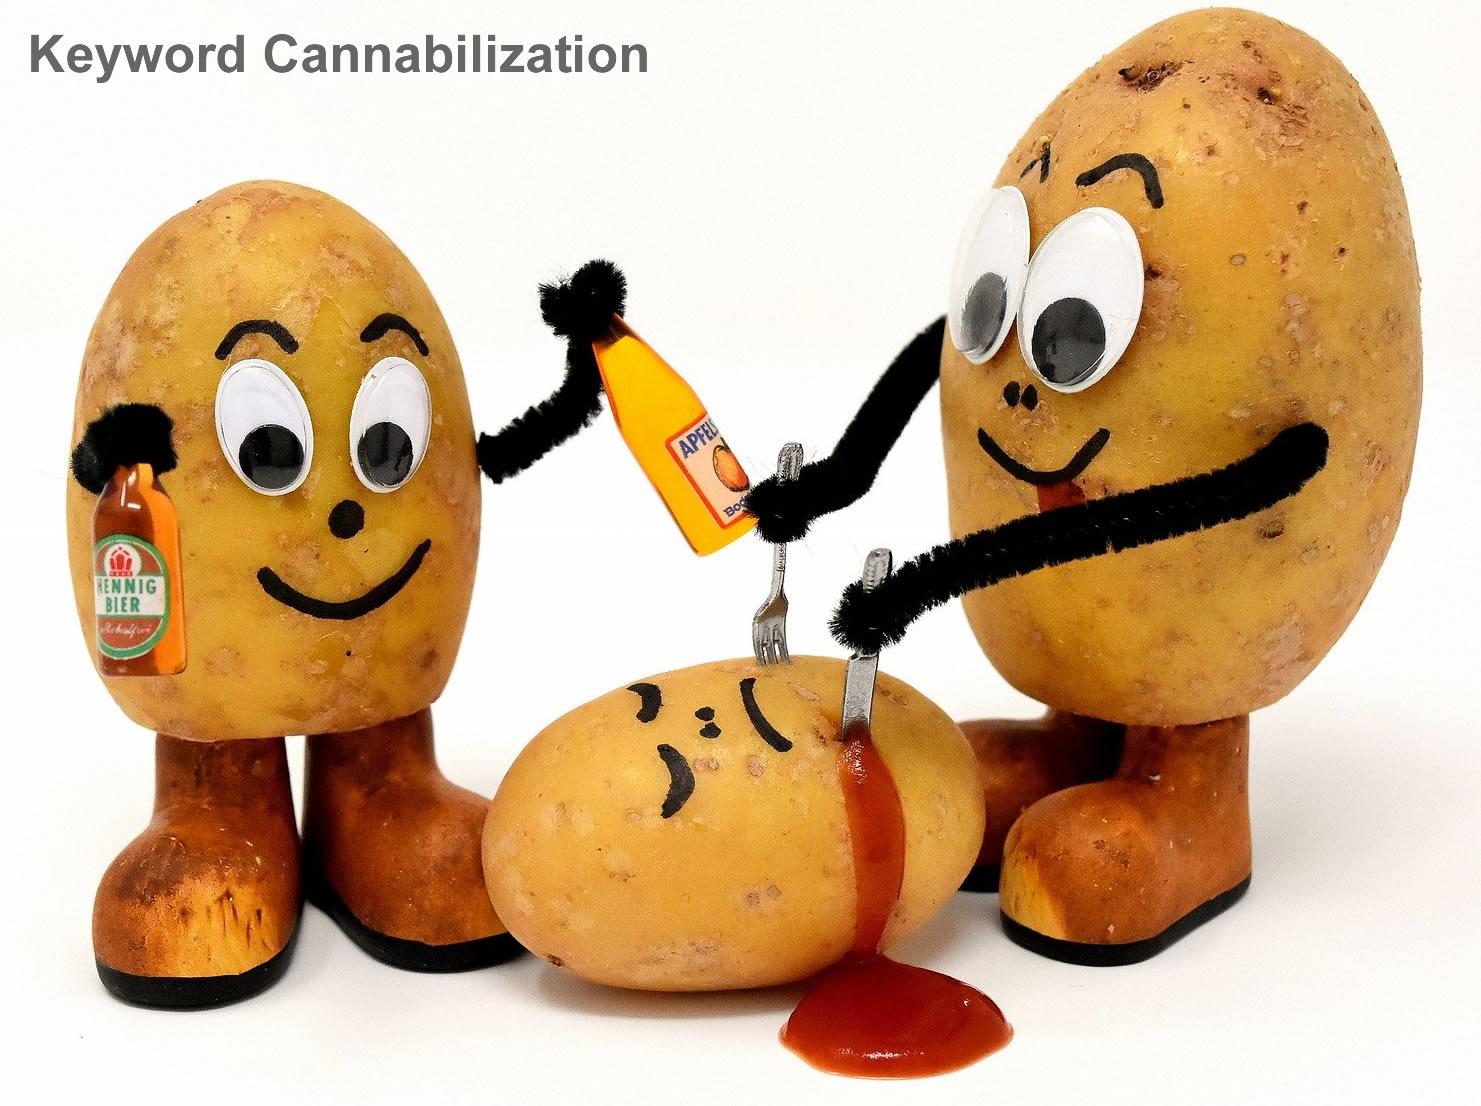 keyword cannibilization image